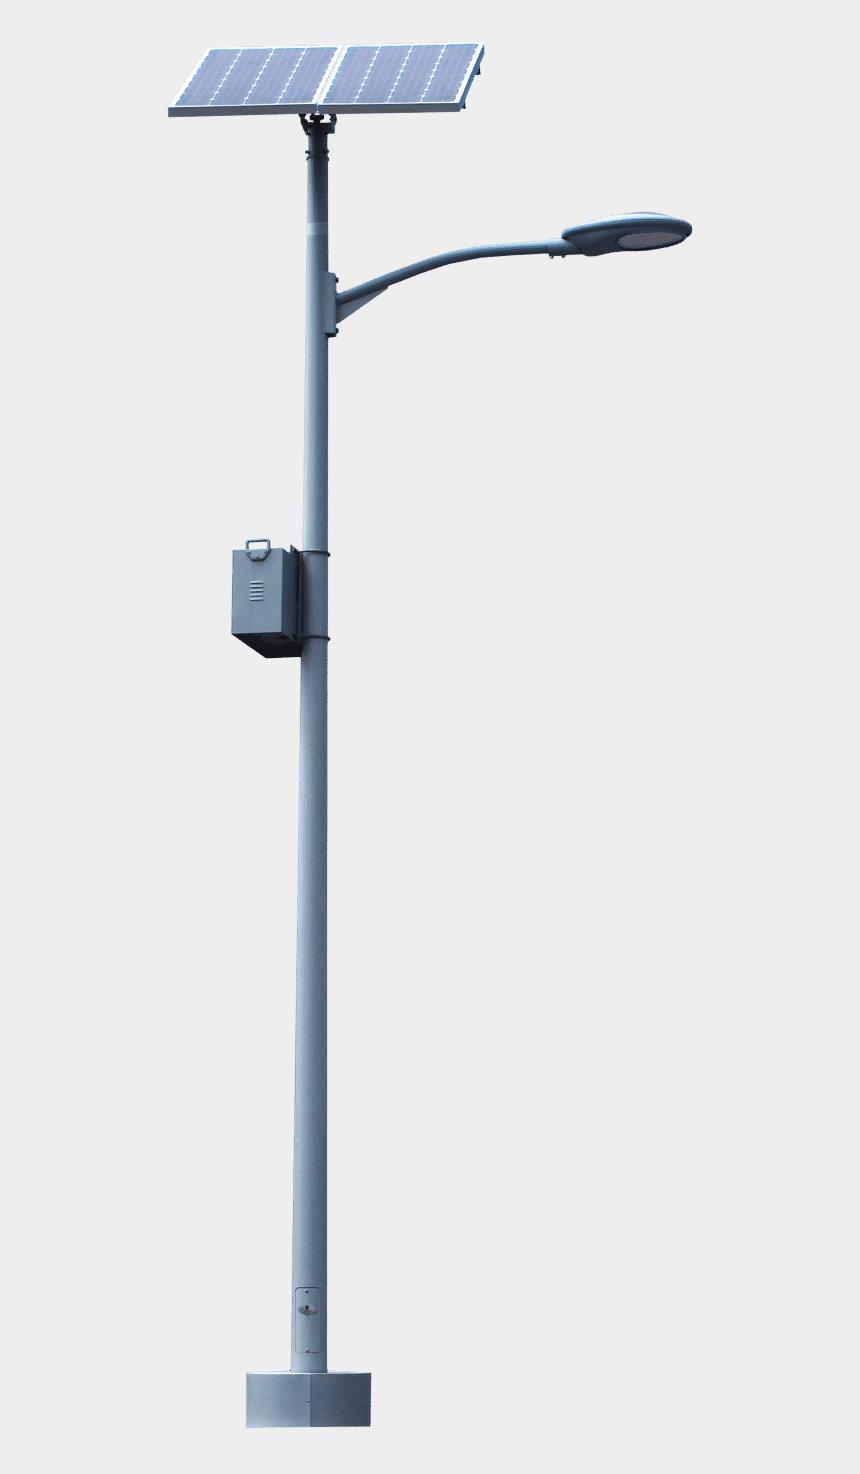 street light poles clipart, Cartoons - Supera Solar Pole Light System - Security